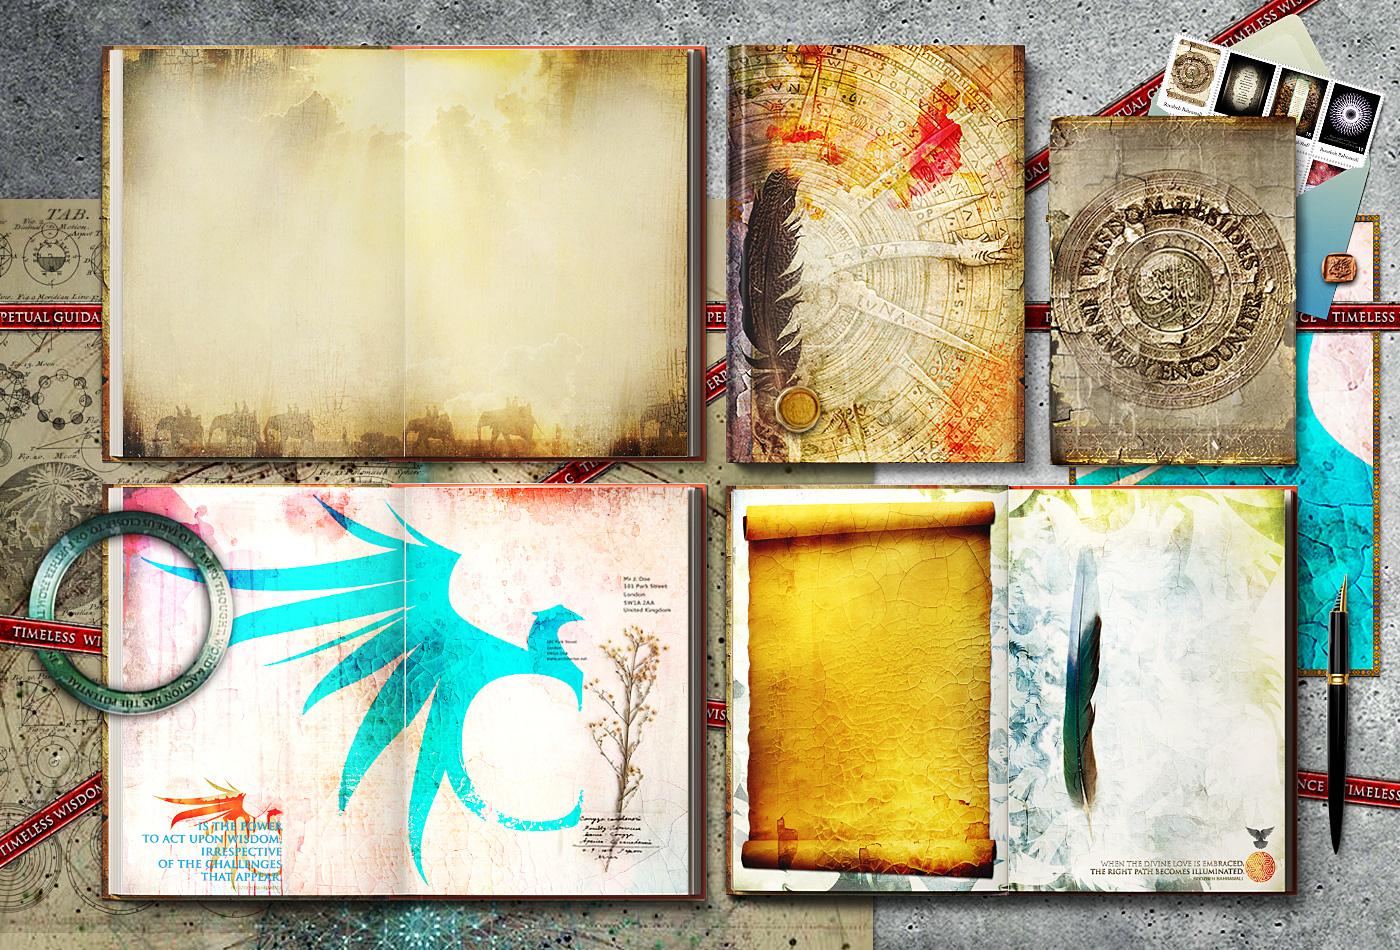 010-Rays-Journals